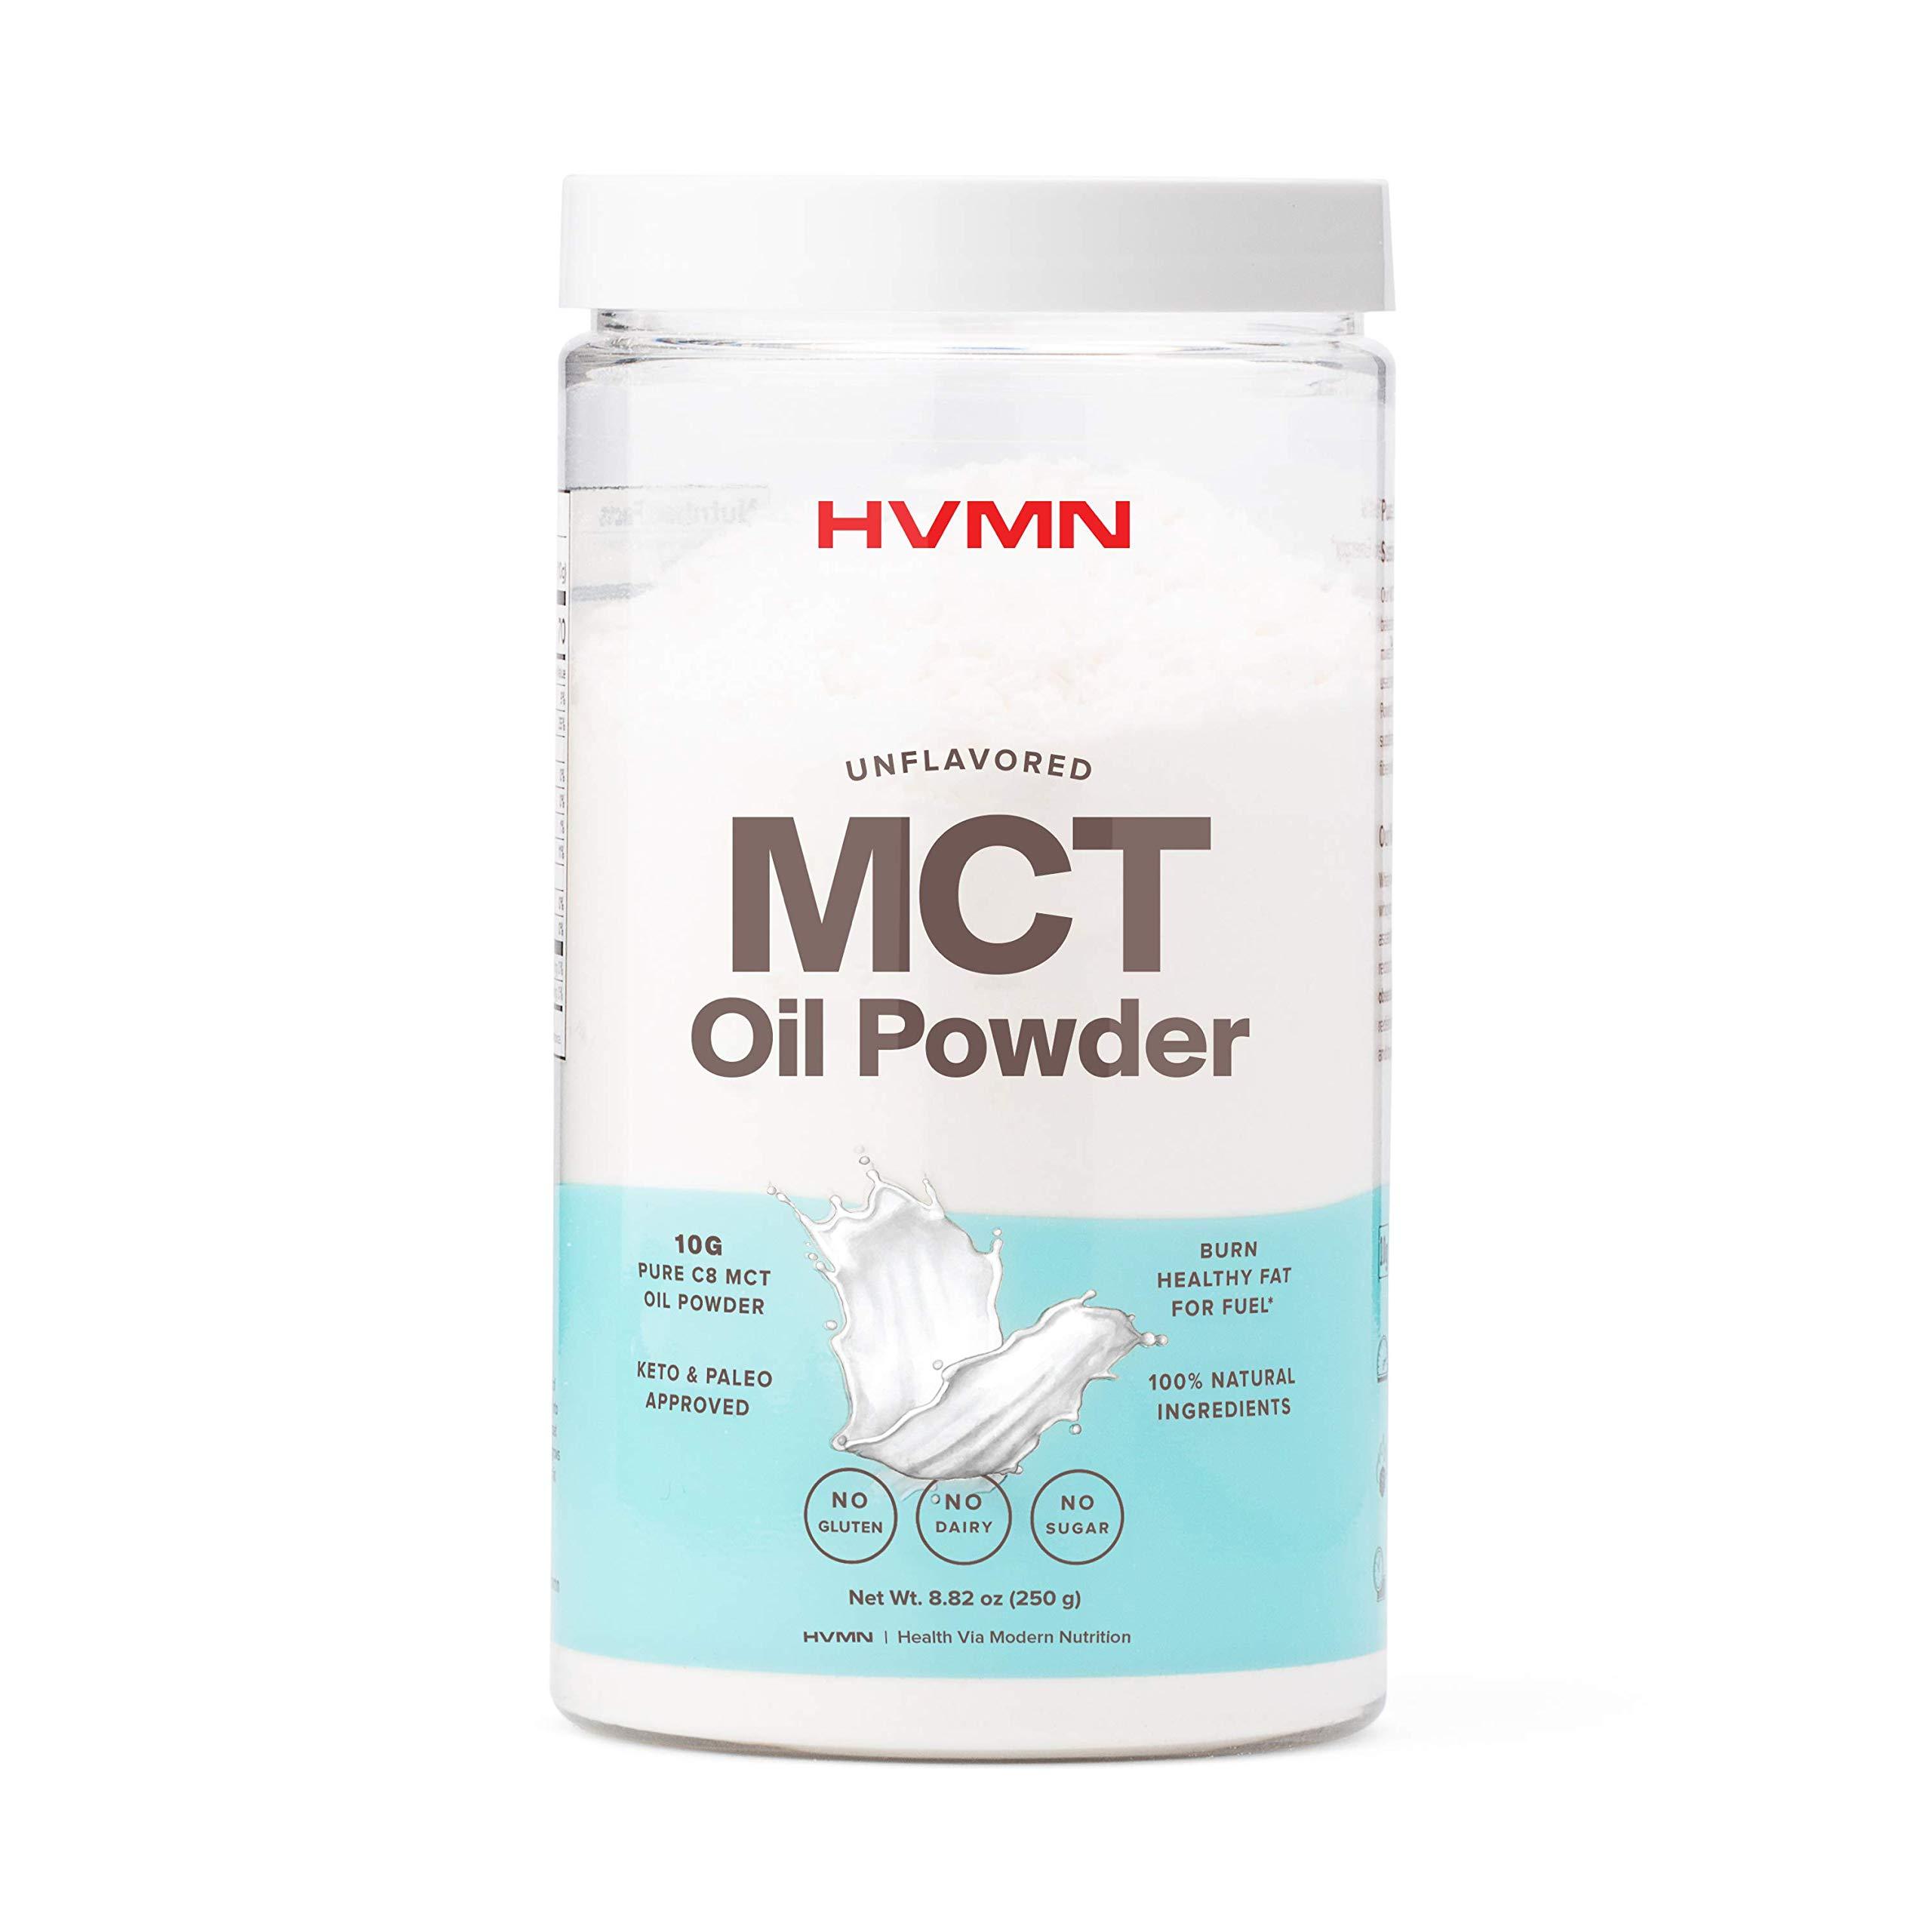 H.V.M.N. MCT Oil Powder - Keto Creamer Powder, for Keto Coffee Creamer, Keto Shake - Pure C8 MCT Oil from Acacia Fiber Powder, MCT Oil Keto Diet Powder - 25 Servings(Unflavored)